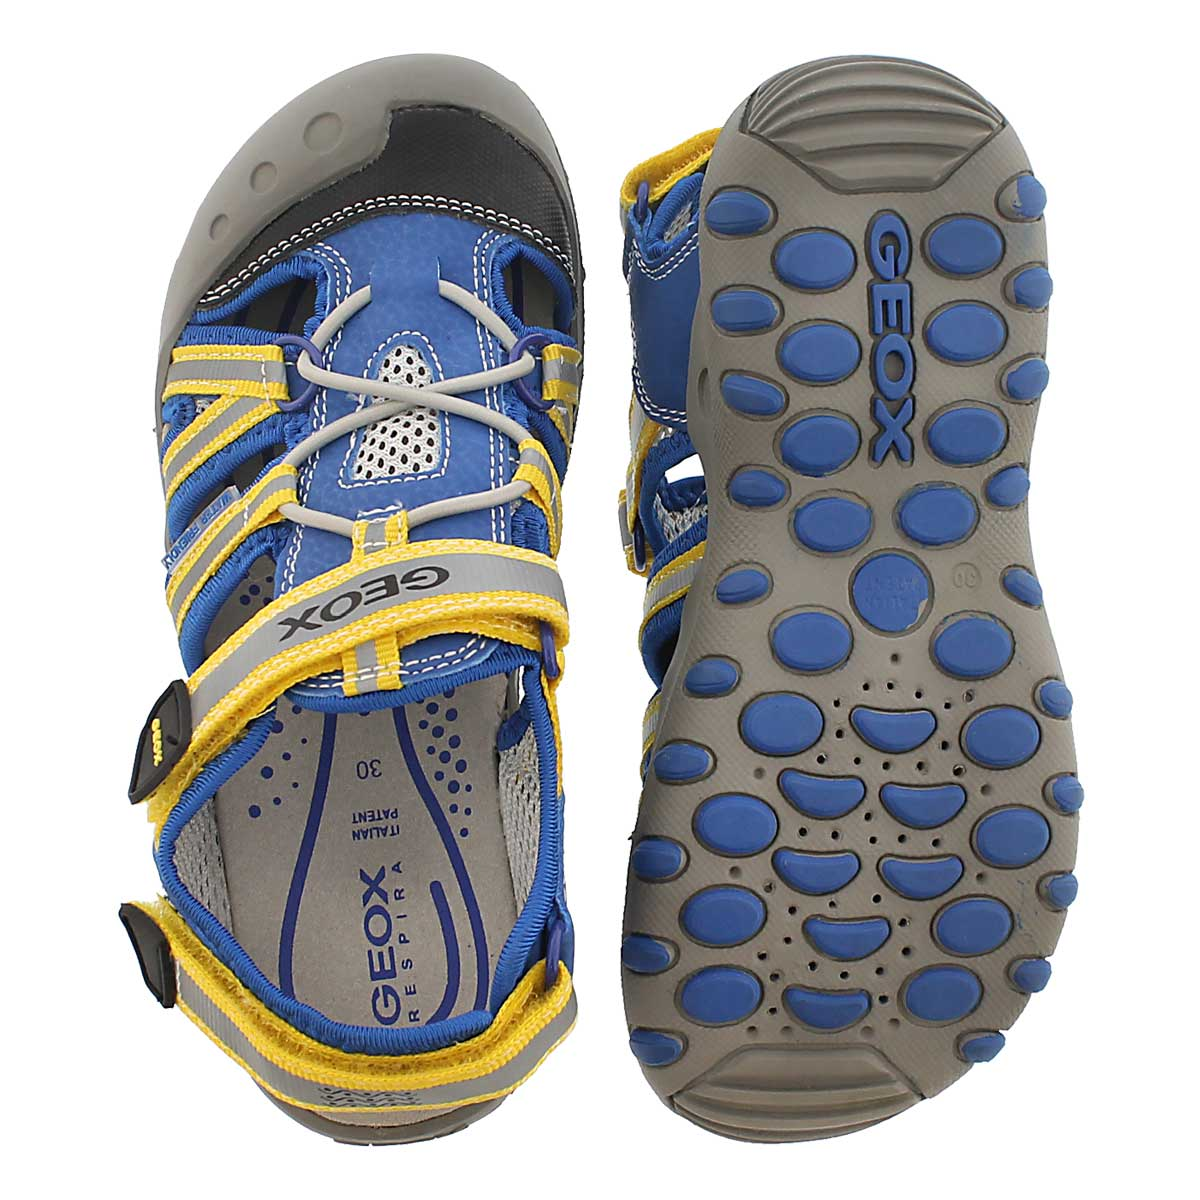 Sandale pêcheur KYLE, bleu/jaune, garçon